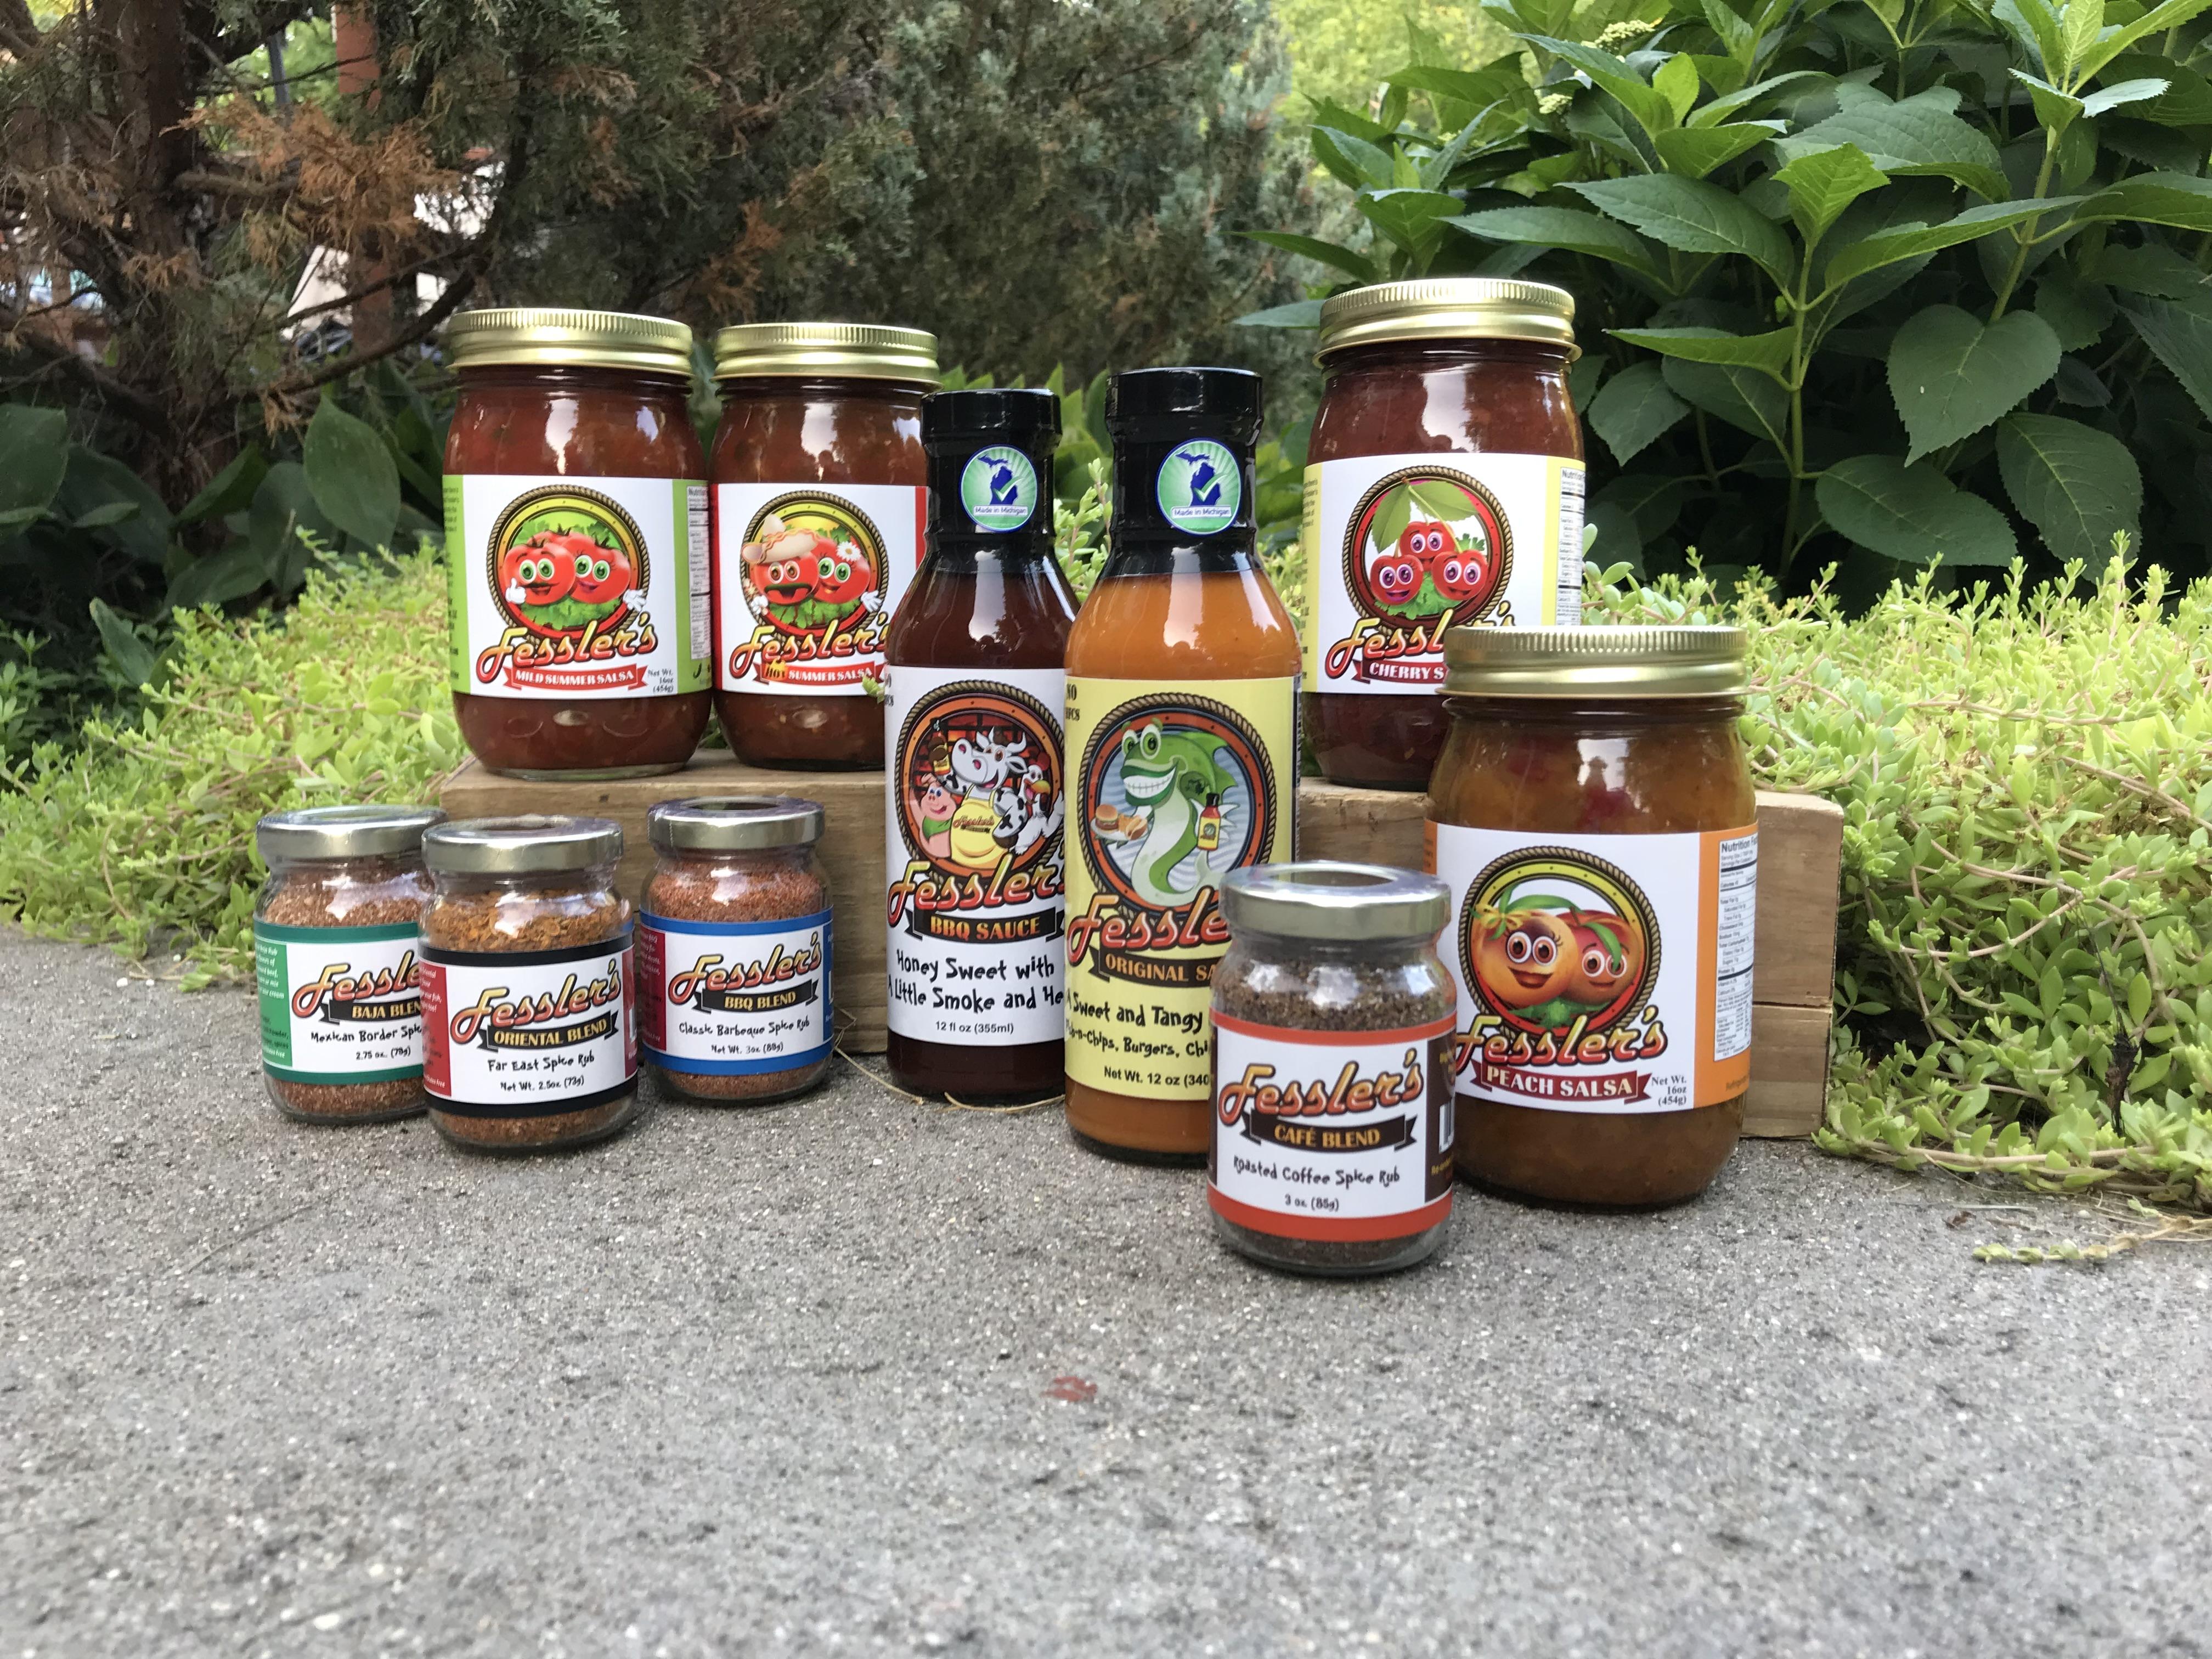 Fessler's Products